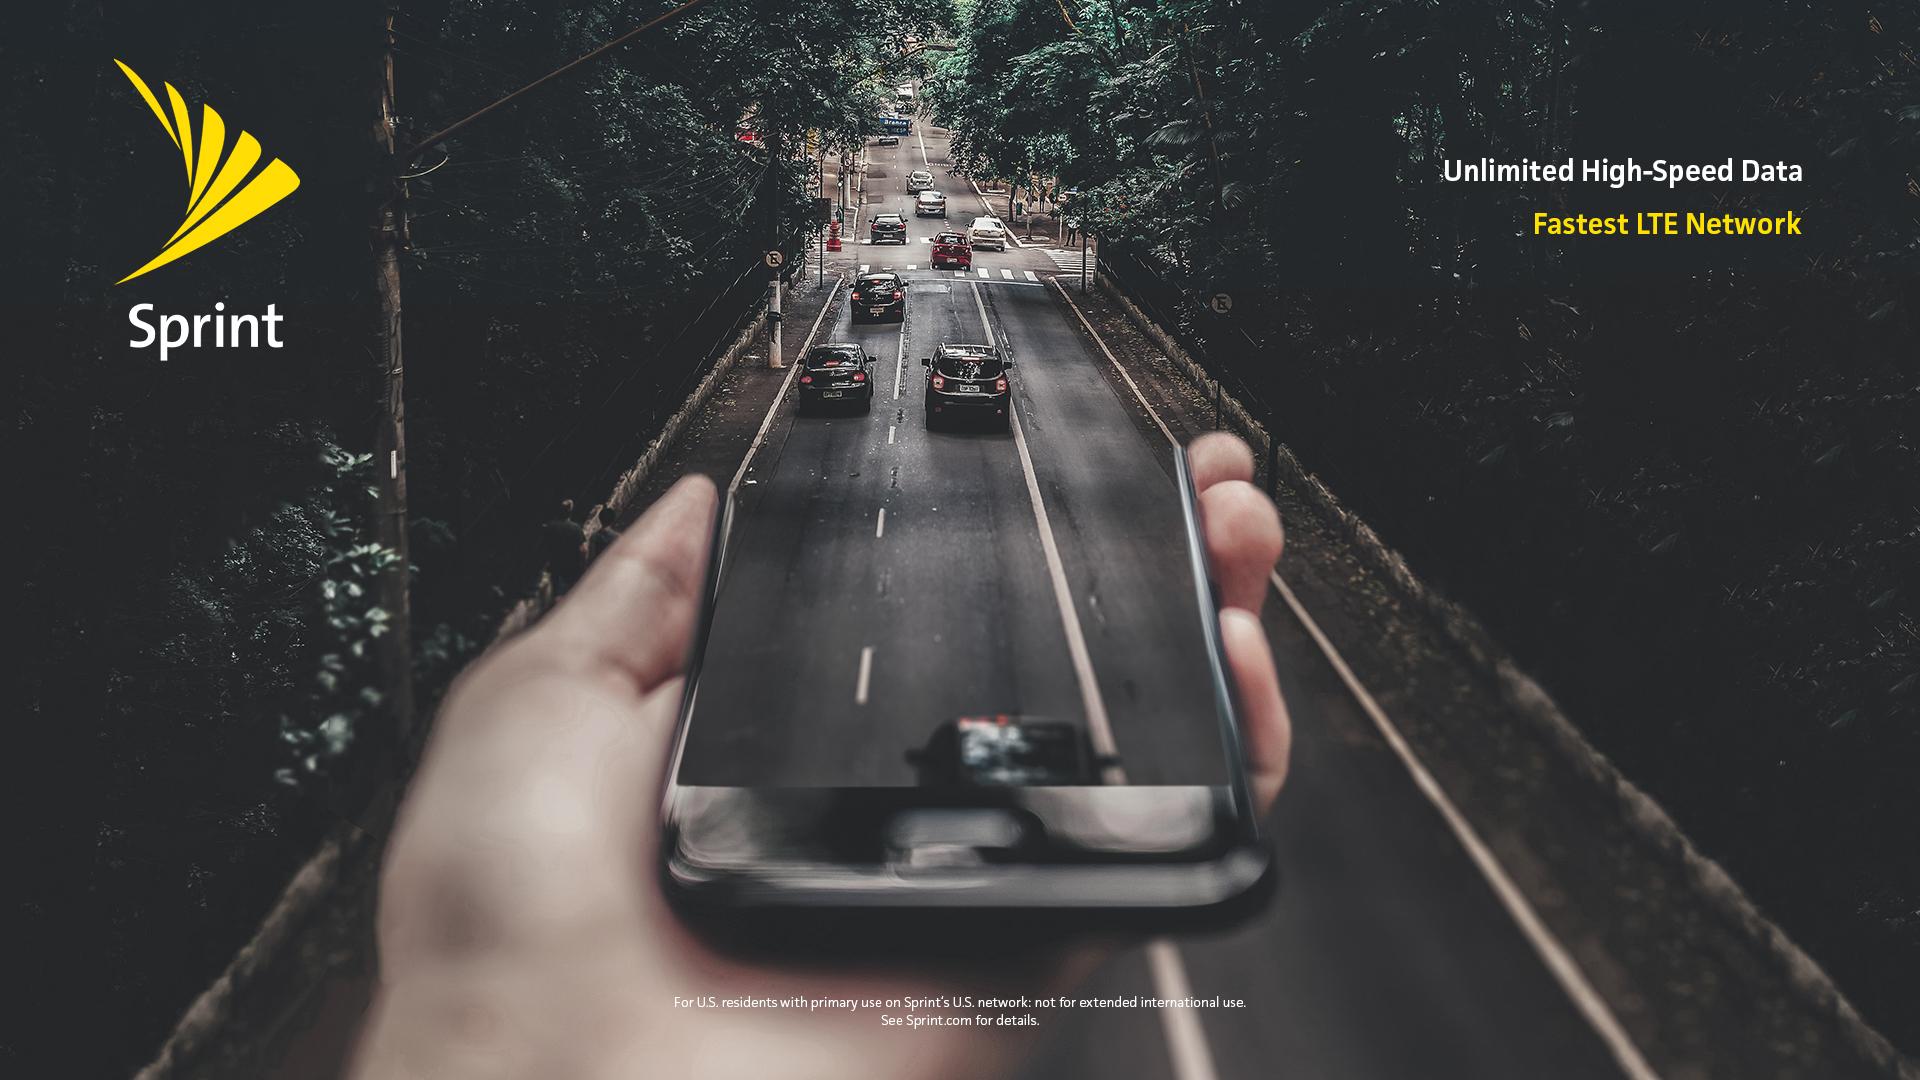 Sprint – Unlimited High-Speed Data